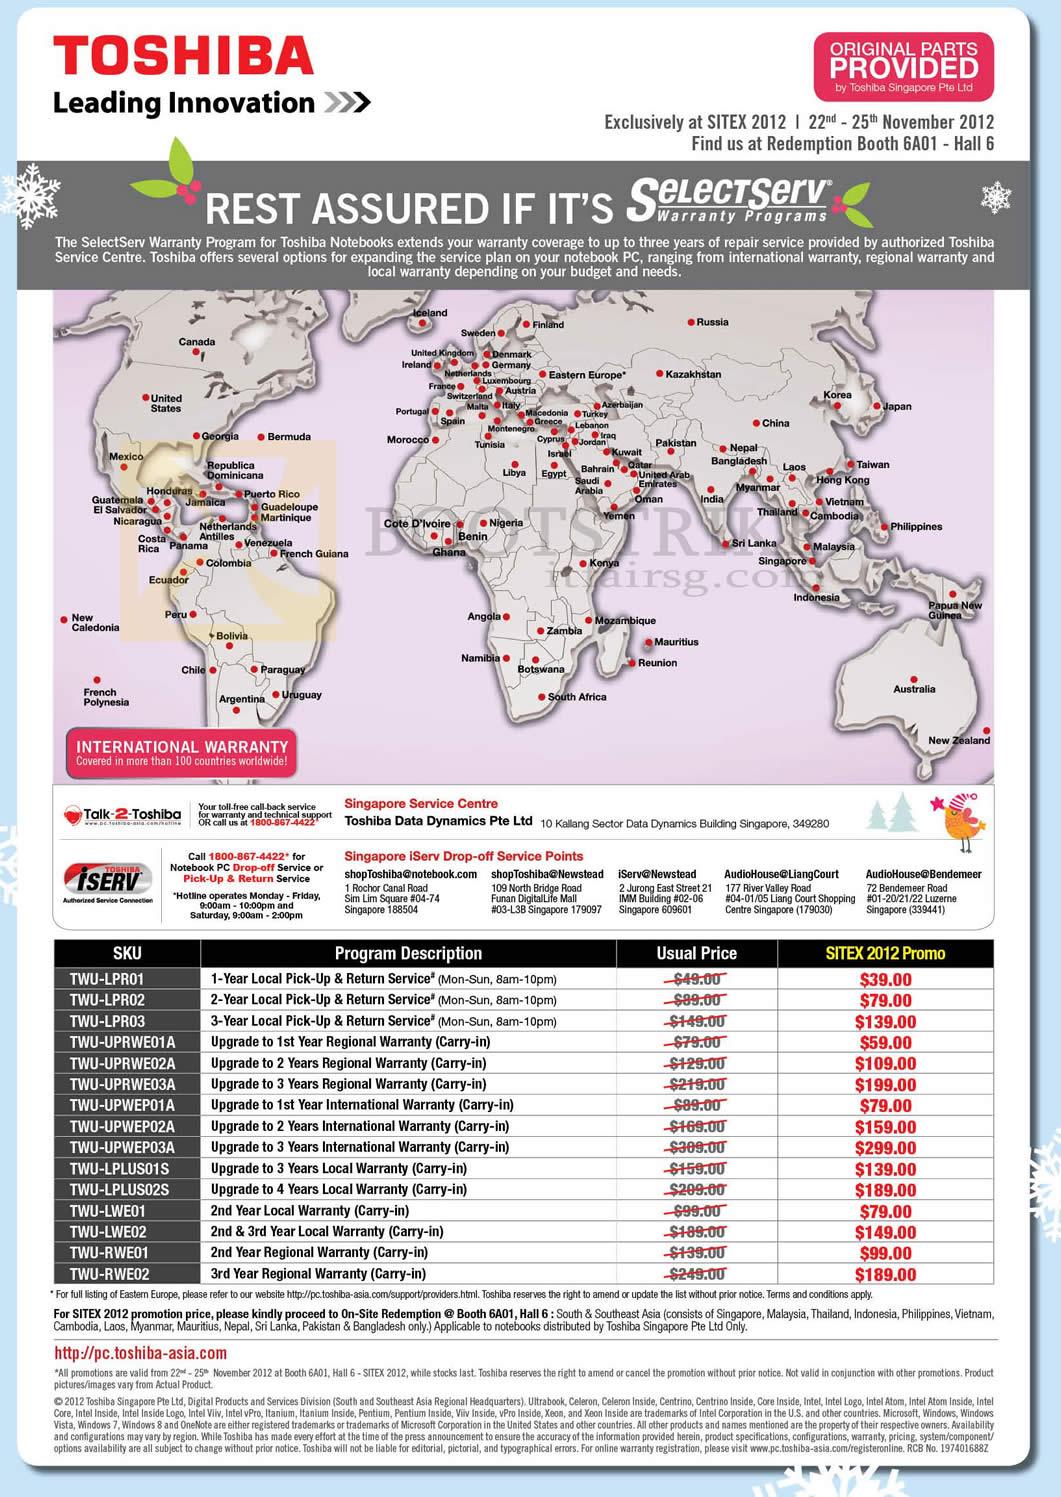 SITEX 2012 price list image brochure of Toshiba SelectServ Warranty Program, Upgrades